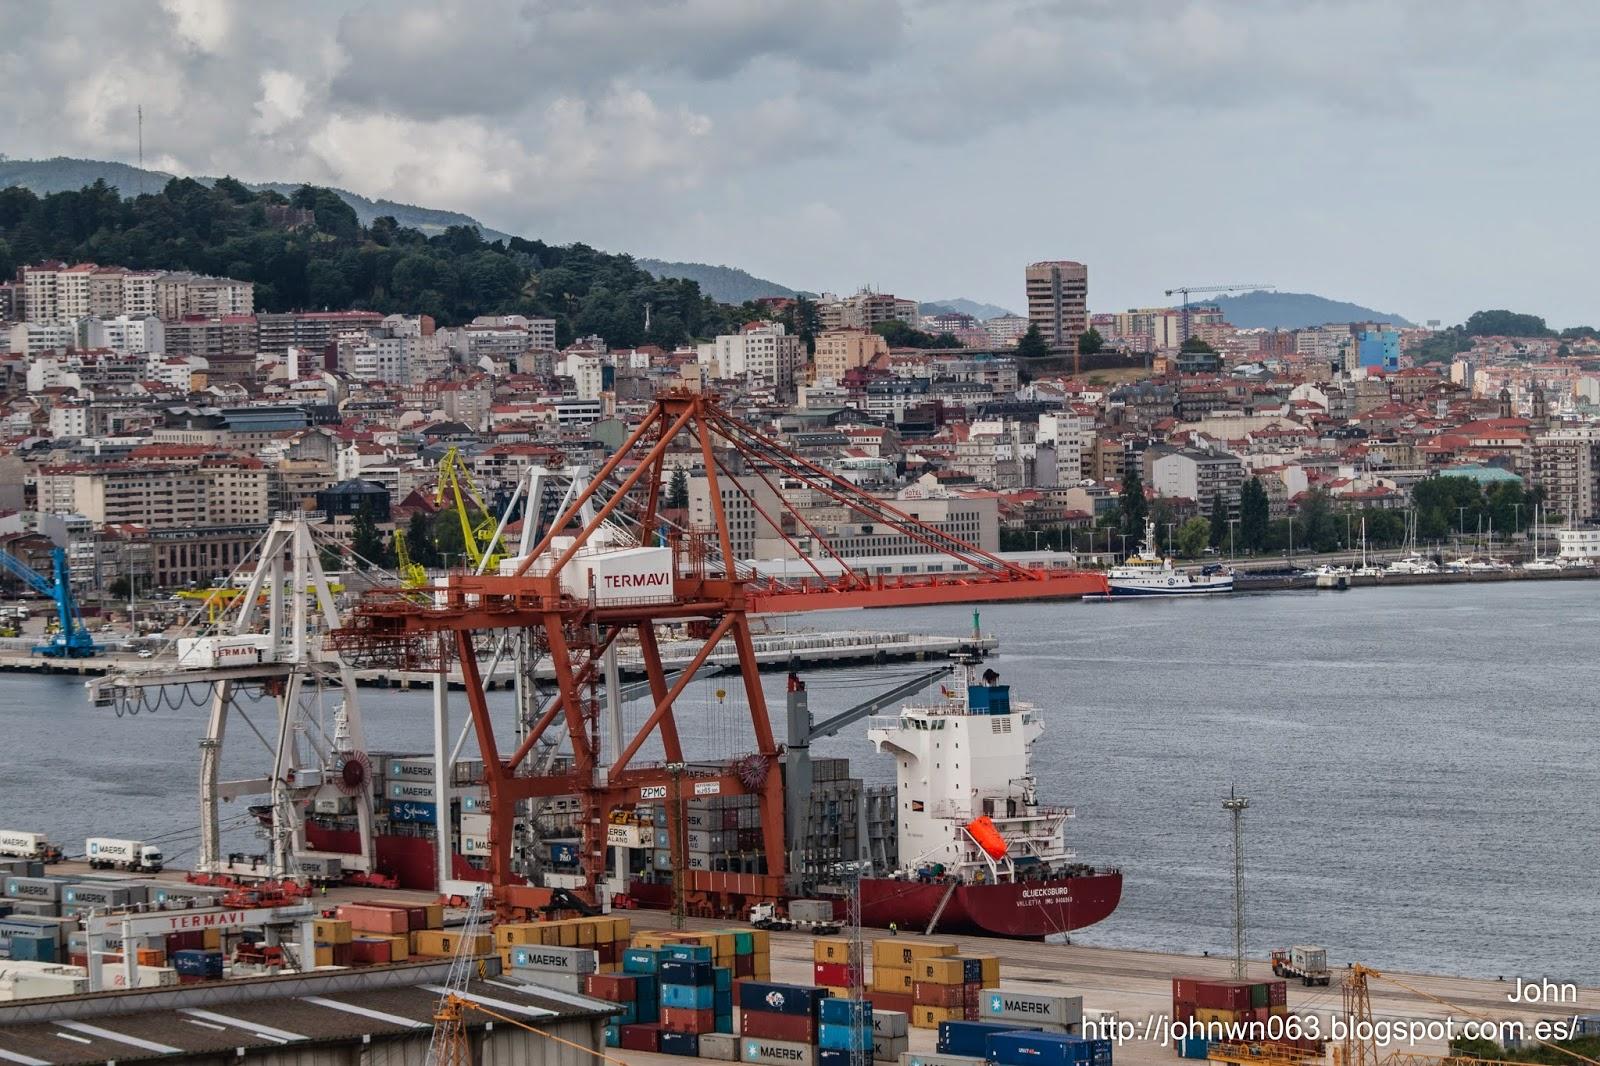 fotos de barcos, gluecksburg, imagenes de barcos, containero, container ship, vigo